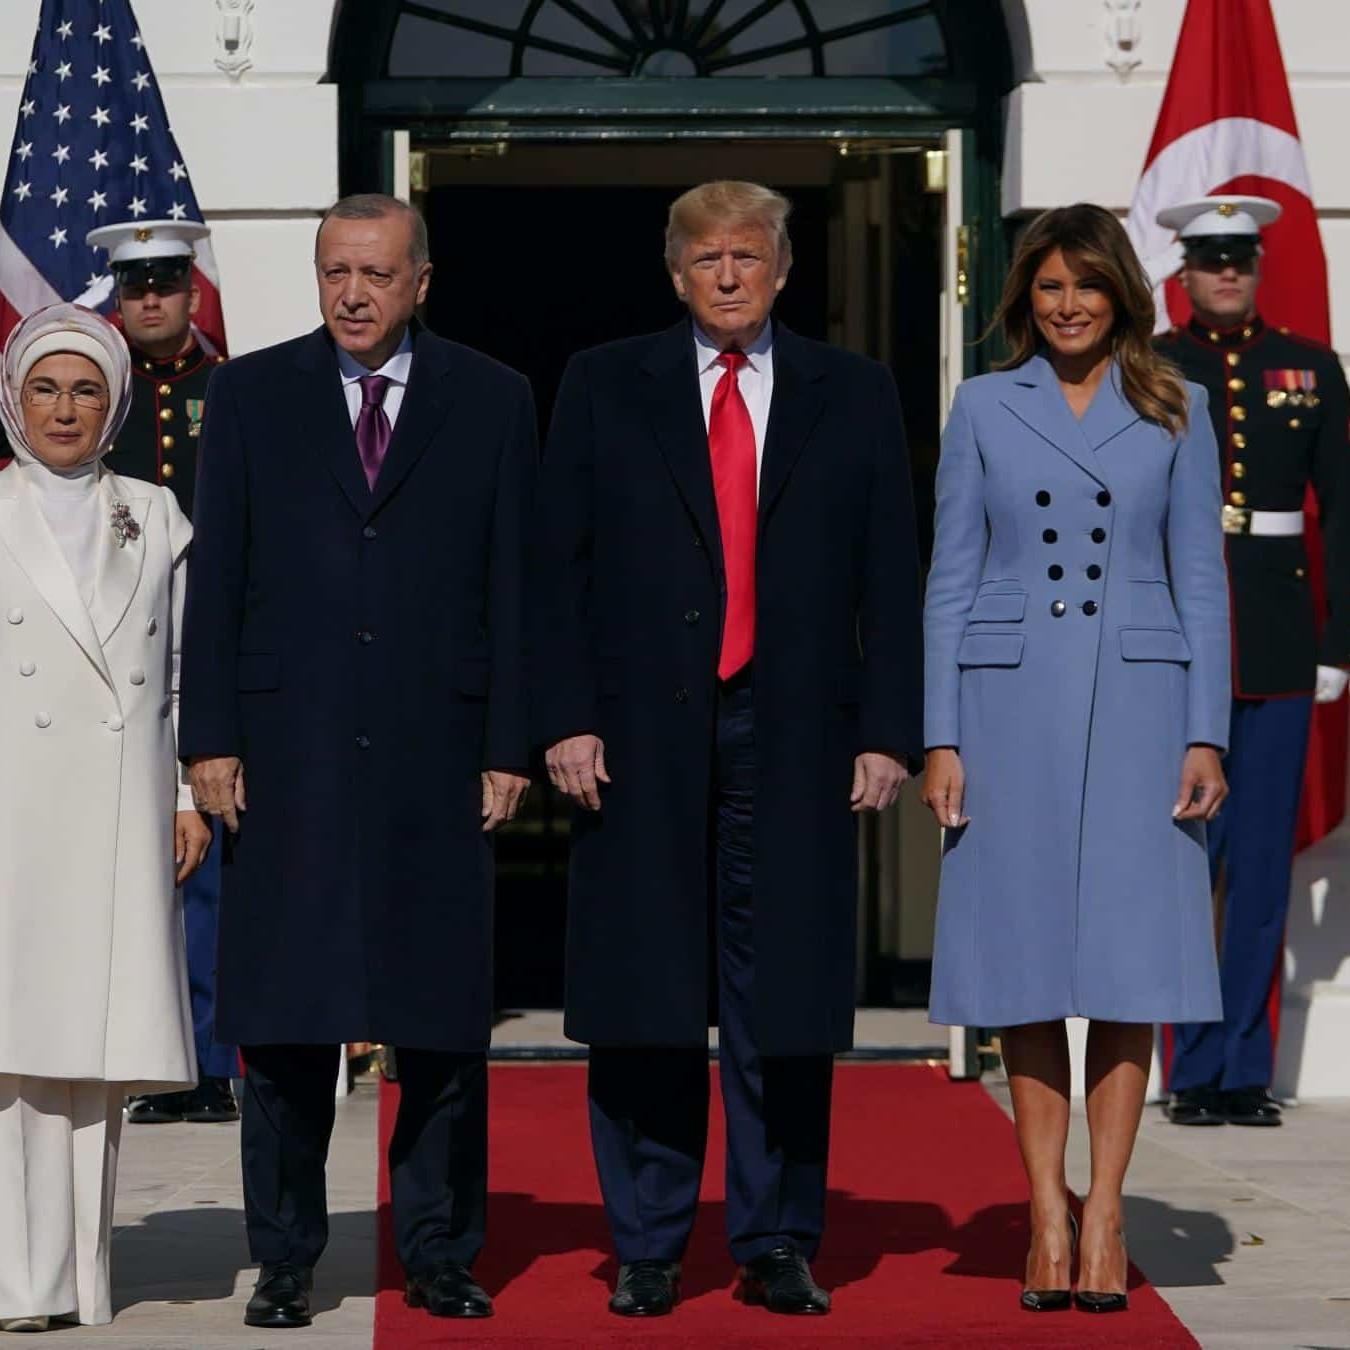 L'incontro tra Trump ed Erdogan alla Casa Bianca